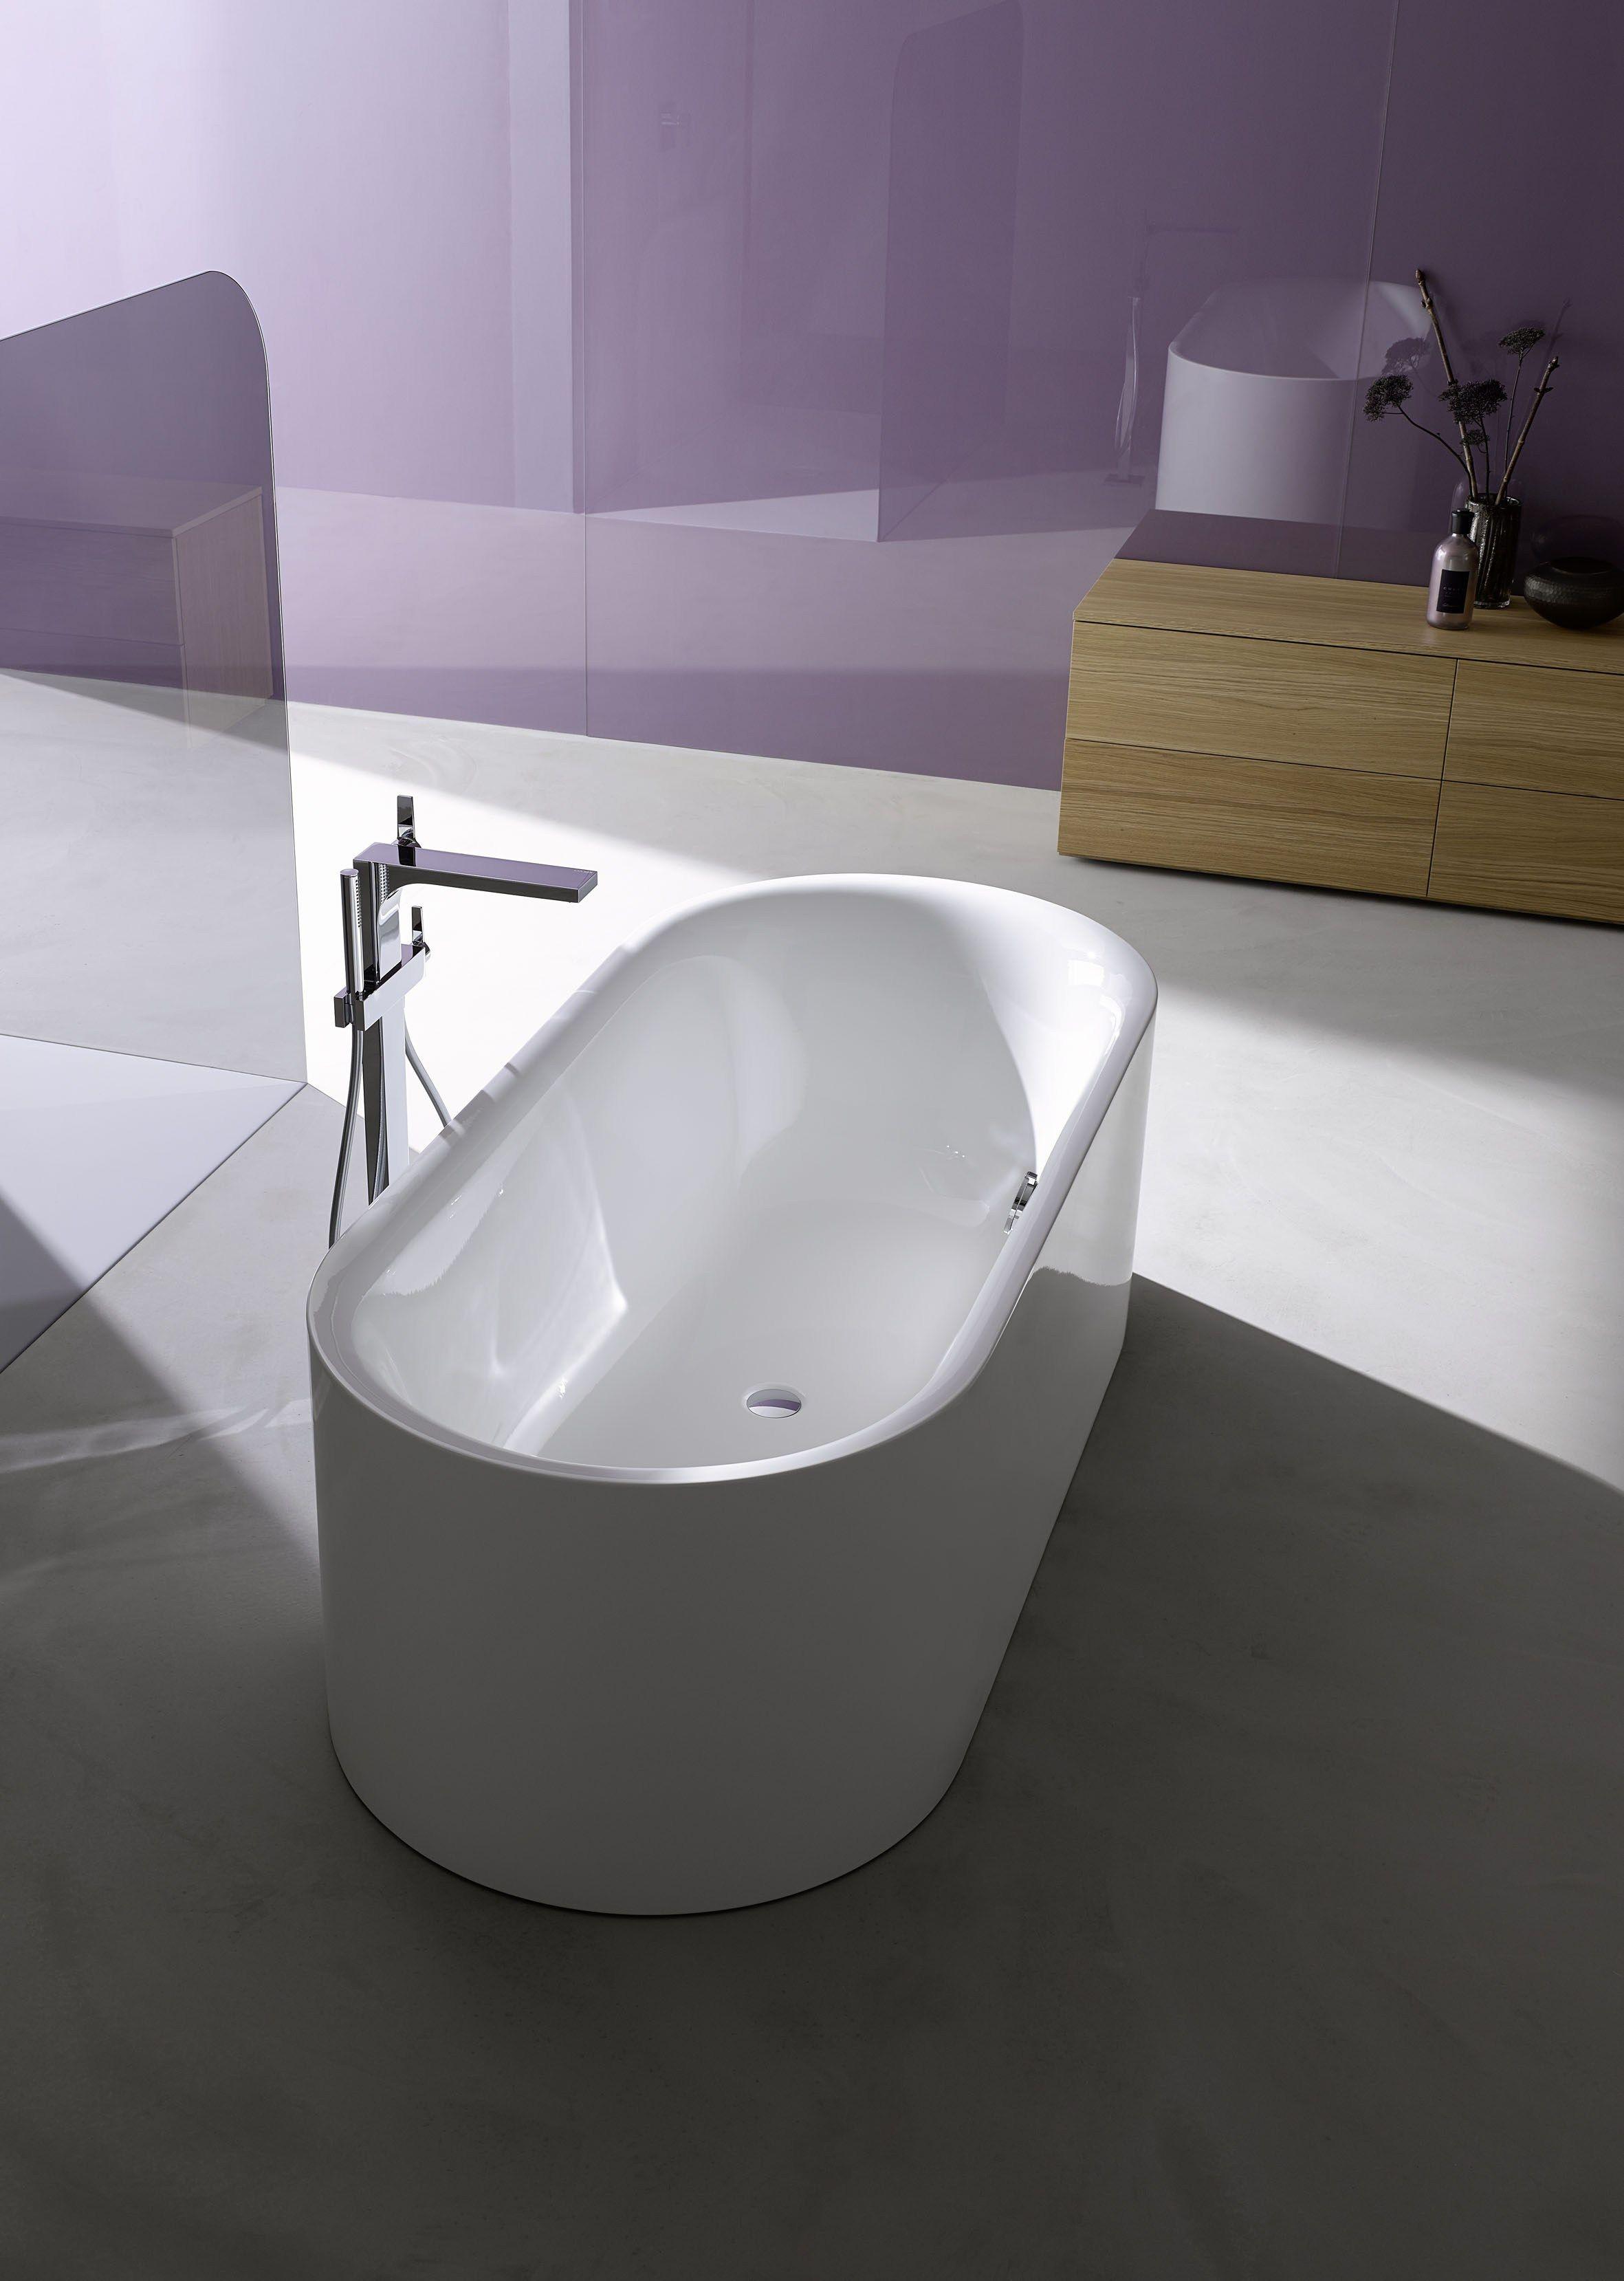 Freistehende Badewanne Oval freistehende ovale badewanne bettelux oval silhouette by bette design tesseraux partner